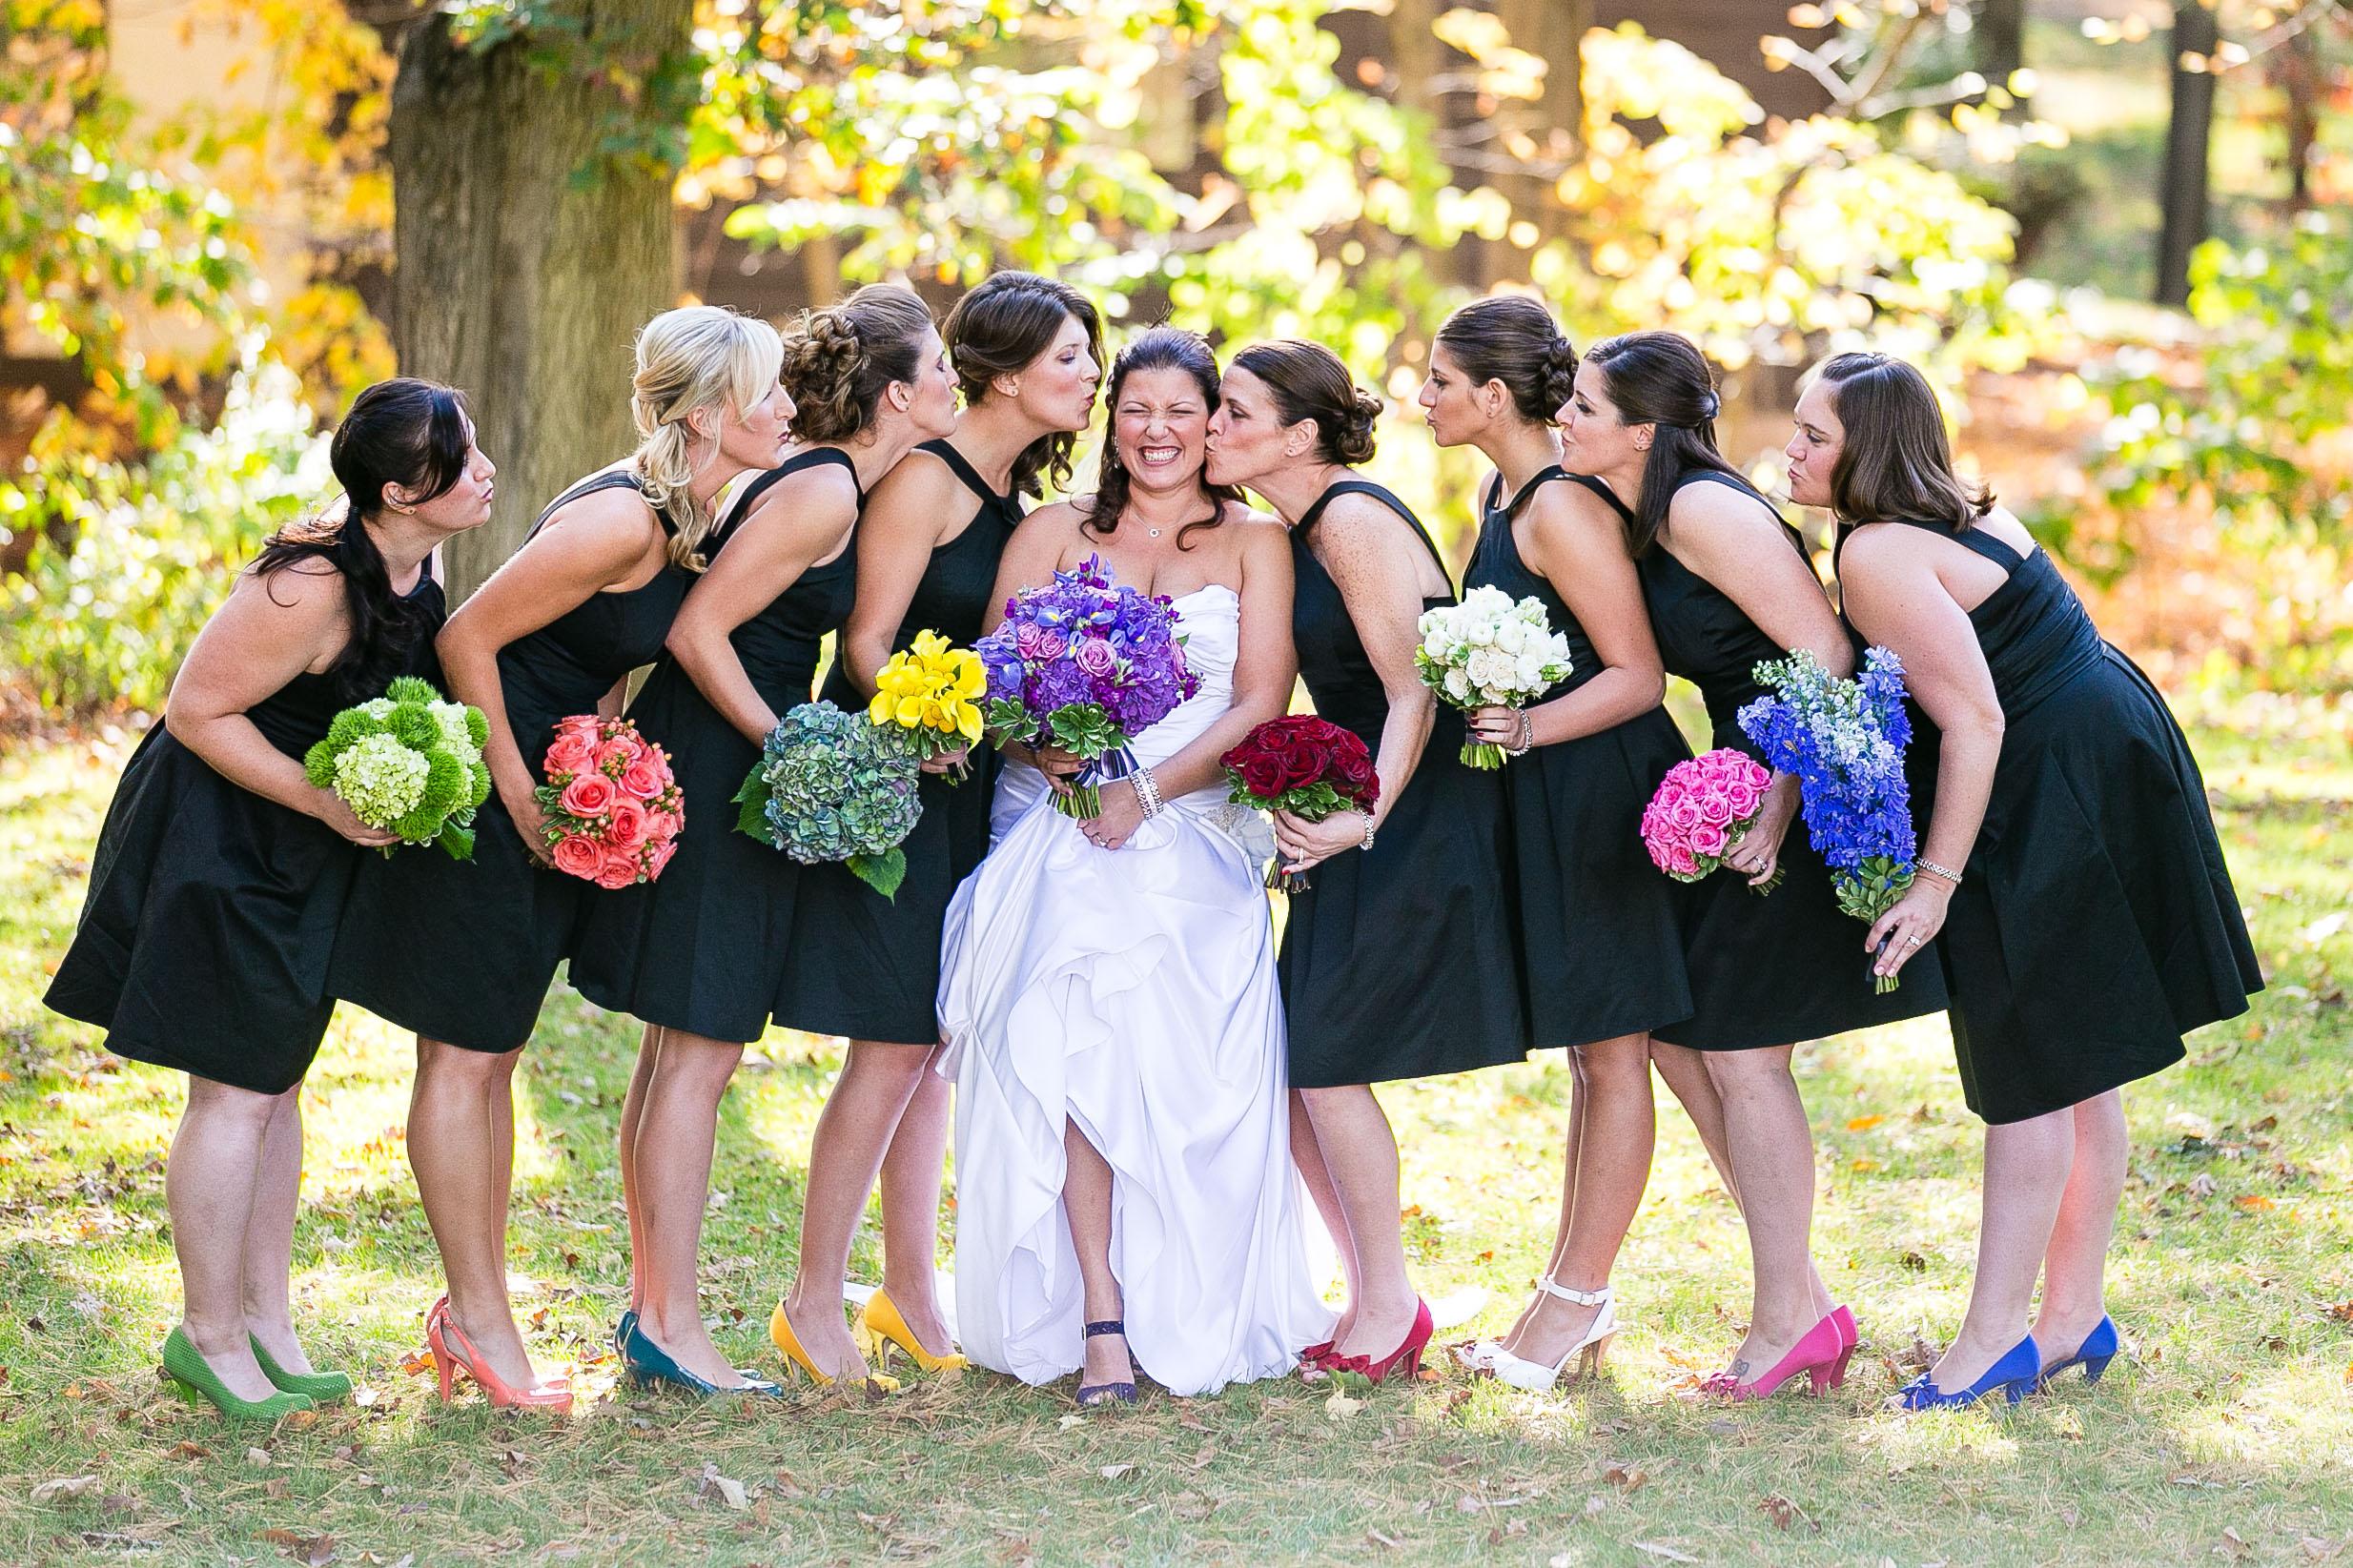 Elegant-Wedding-The-Fox-Hill-Inn-Brookfield-Connecticut-Photojournalistic-Photography-by-Jacek-Dolata-12.jpg